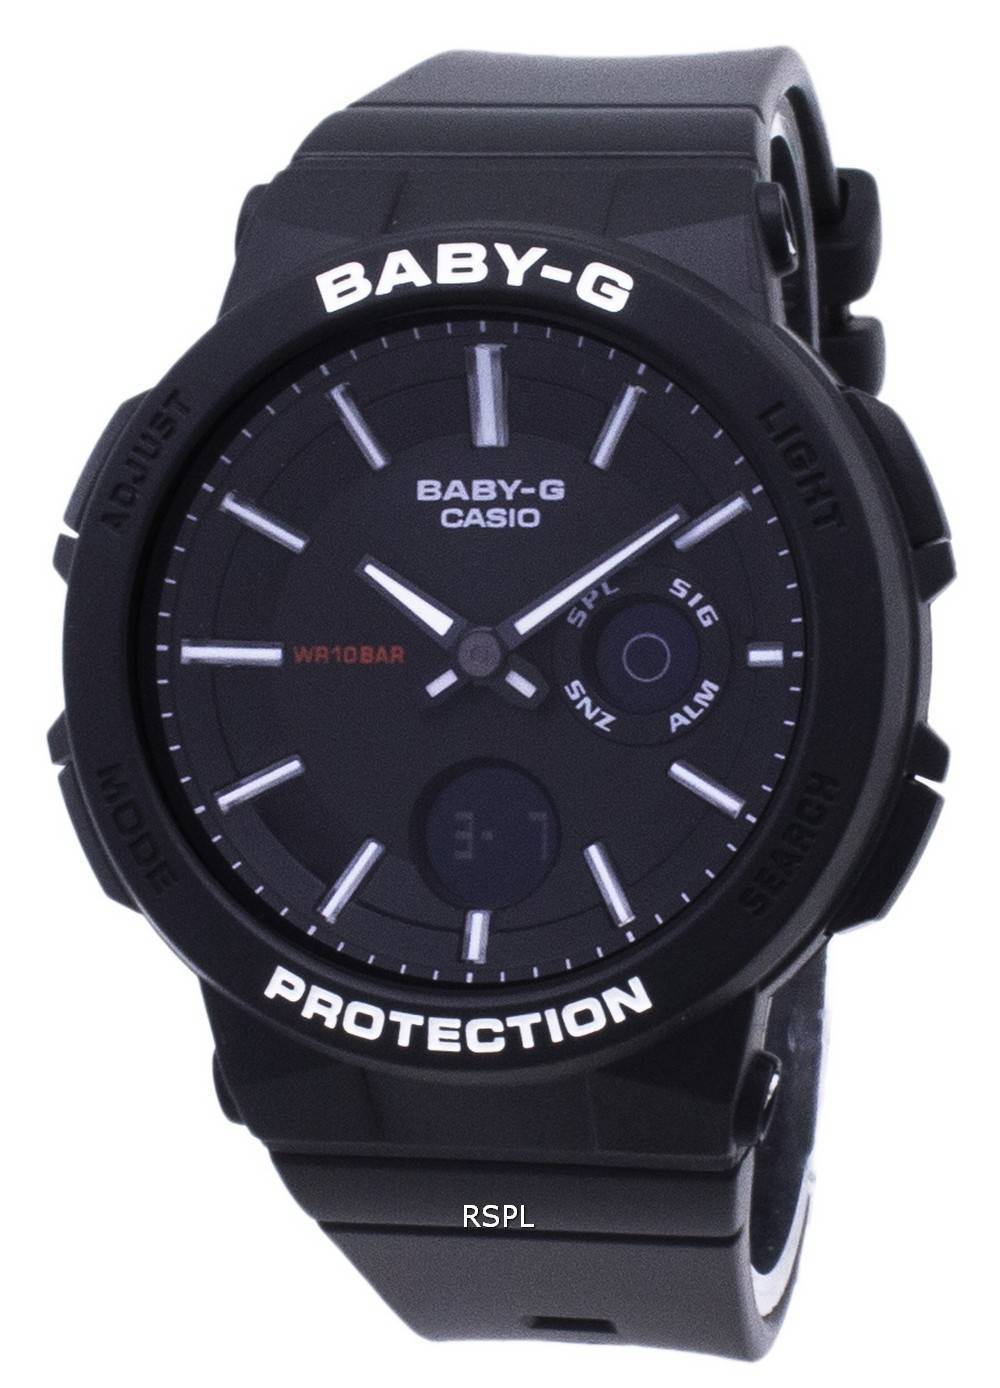 Casio Baby-G BGA-255-1A BGA255-1A Analog Digital Women's Watch